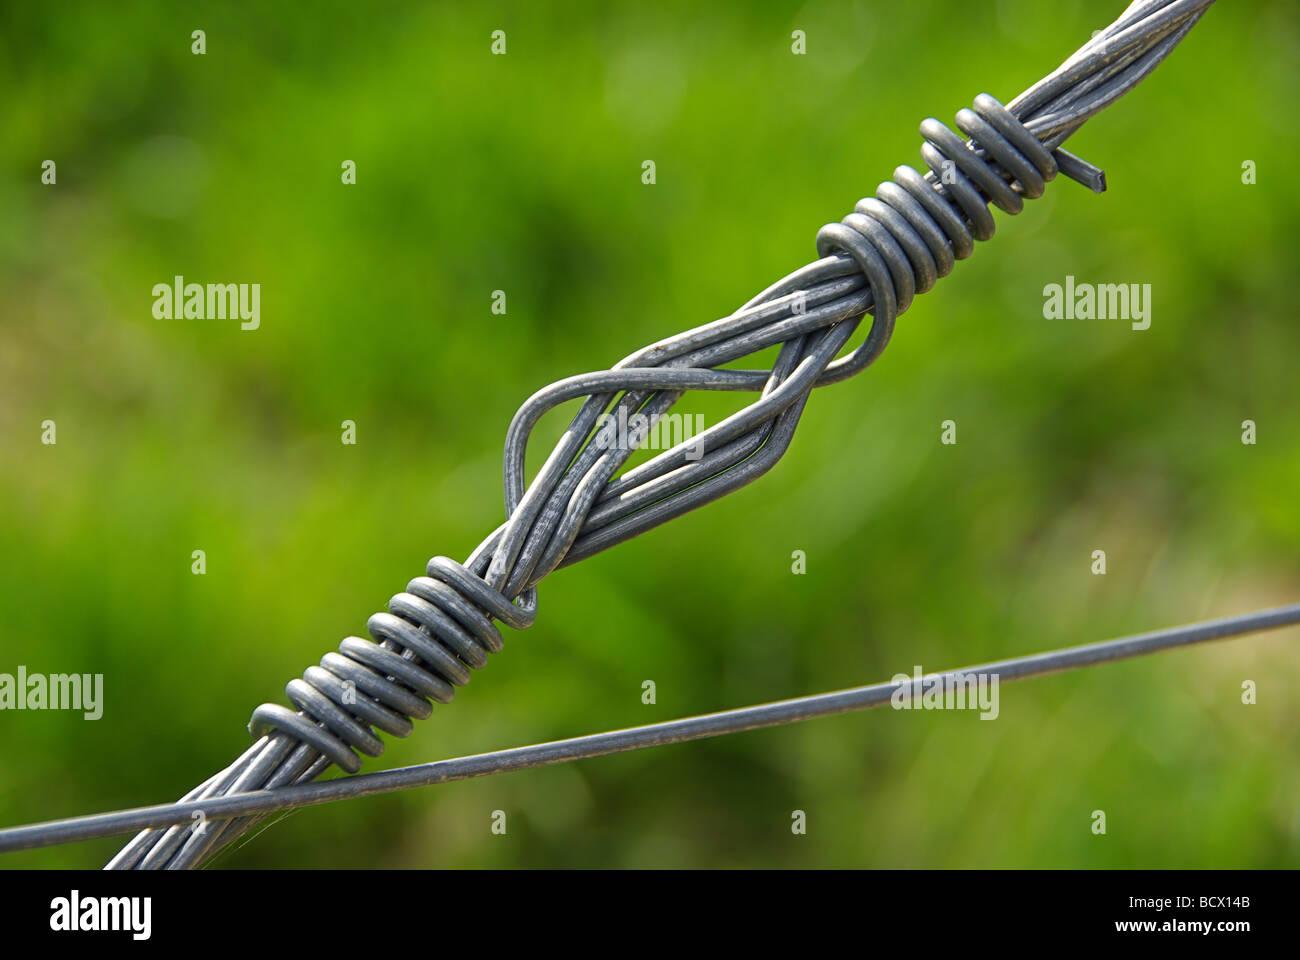 Seil Knoten Stockfotos & Seil Knoten Bilder - Alamy